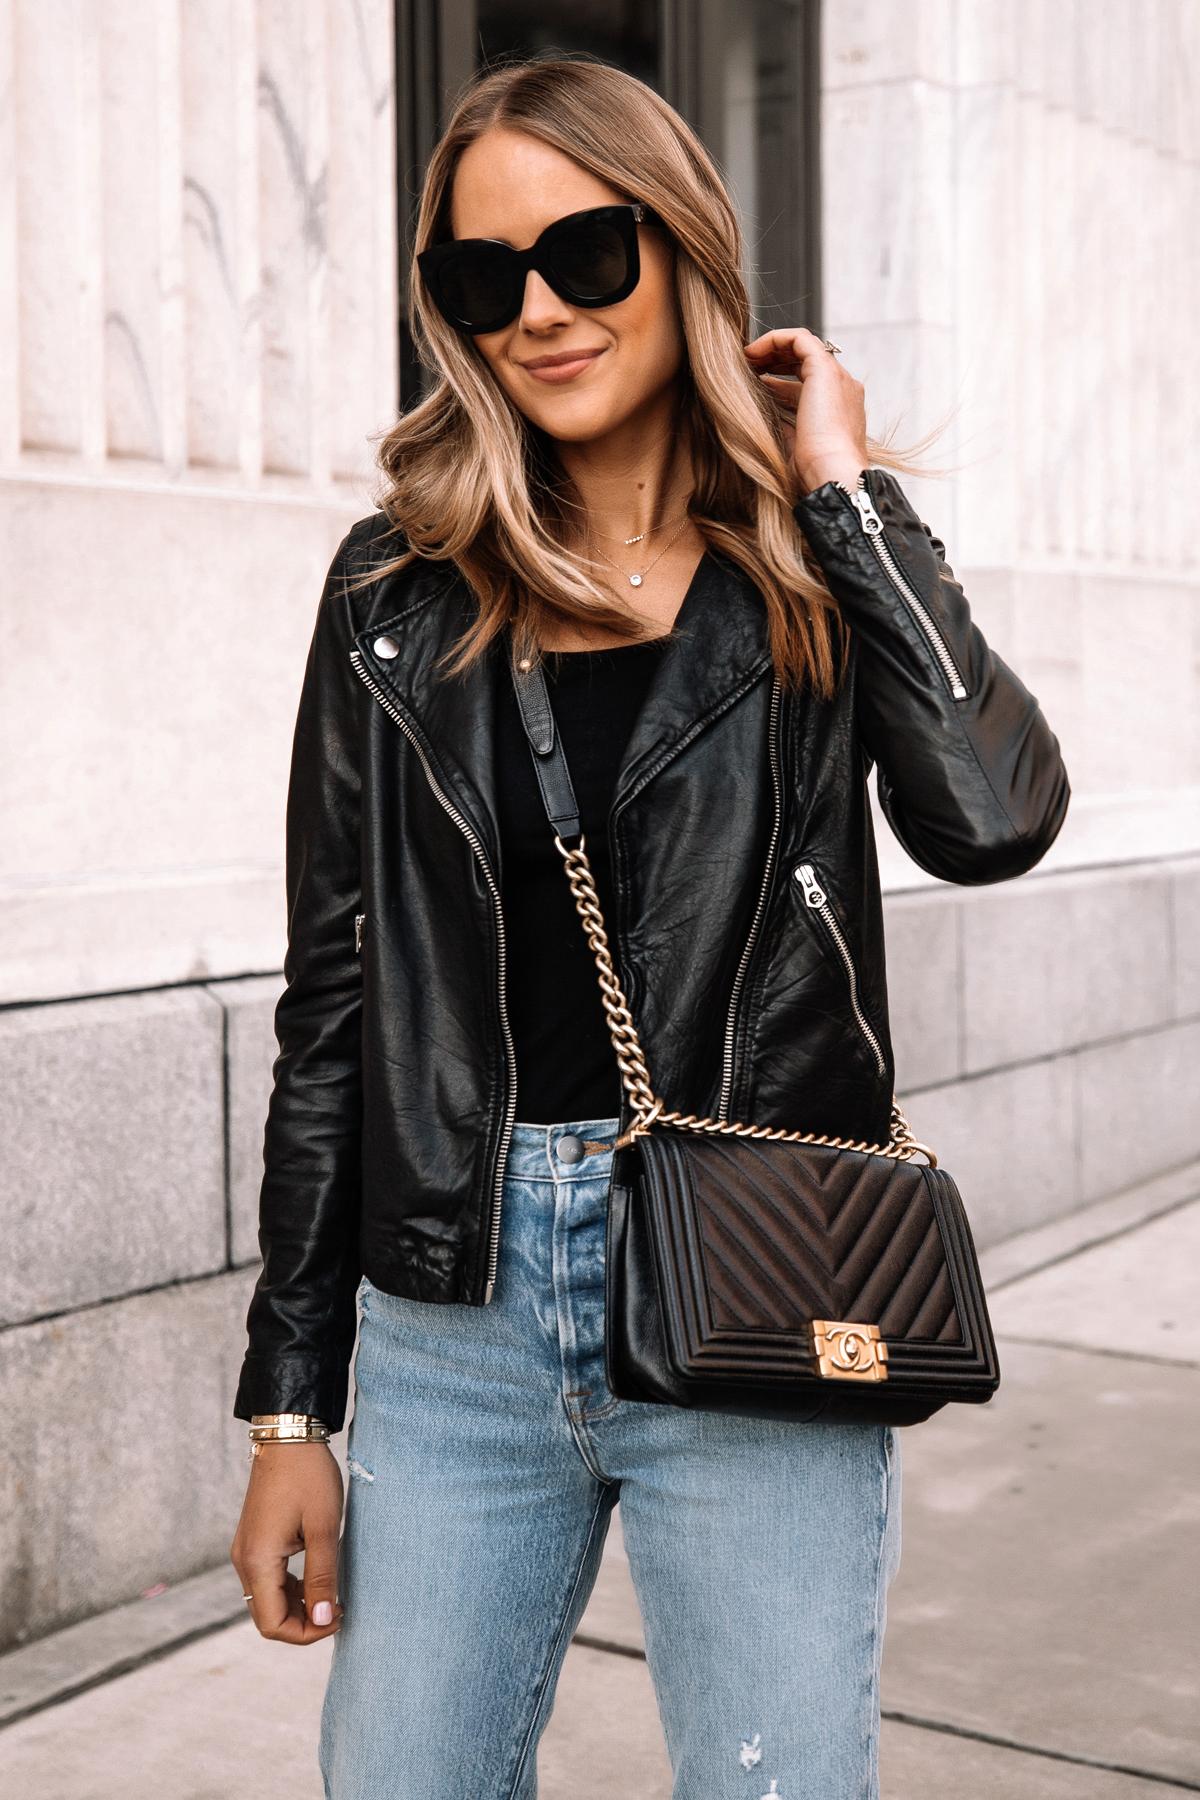 Fashion Jackson Wearing Madewell Black Leather Jacket Denim Jeans Chanel Black Boy Bag 1